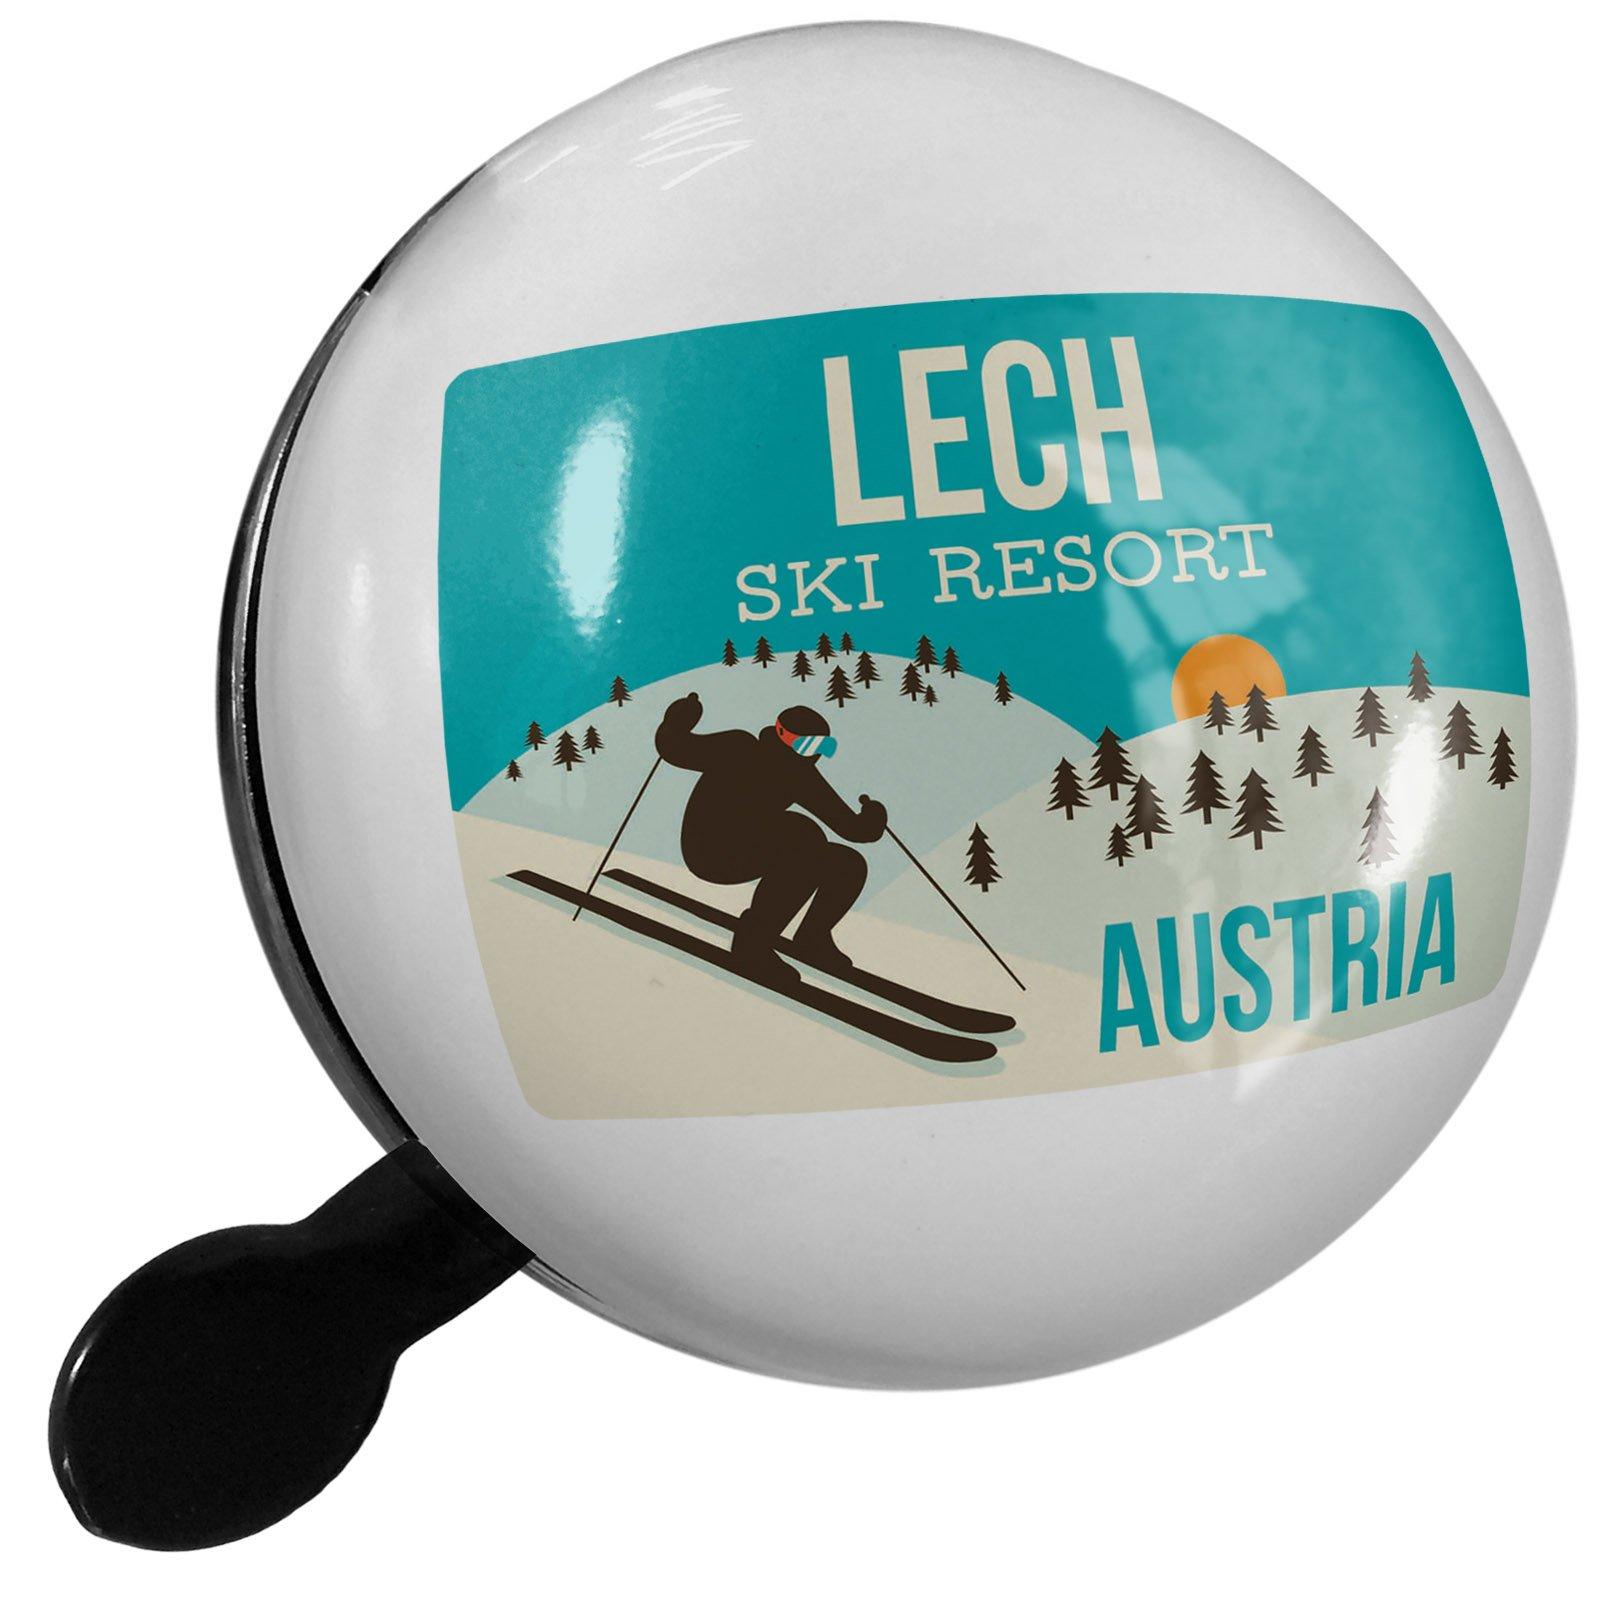 Small Bike Bell Lech Ski Resort - Austria Ski Resort - NEONBLOND